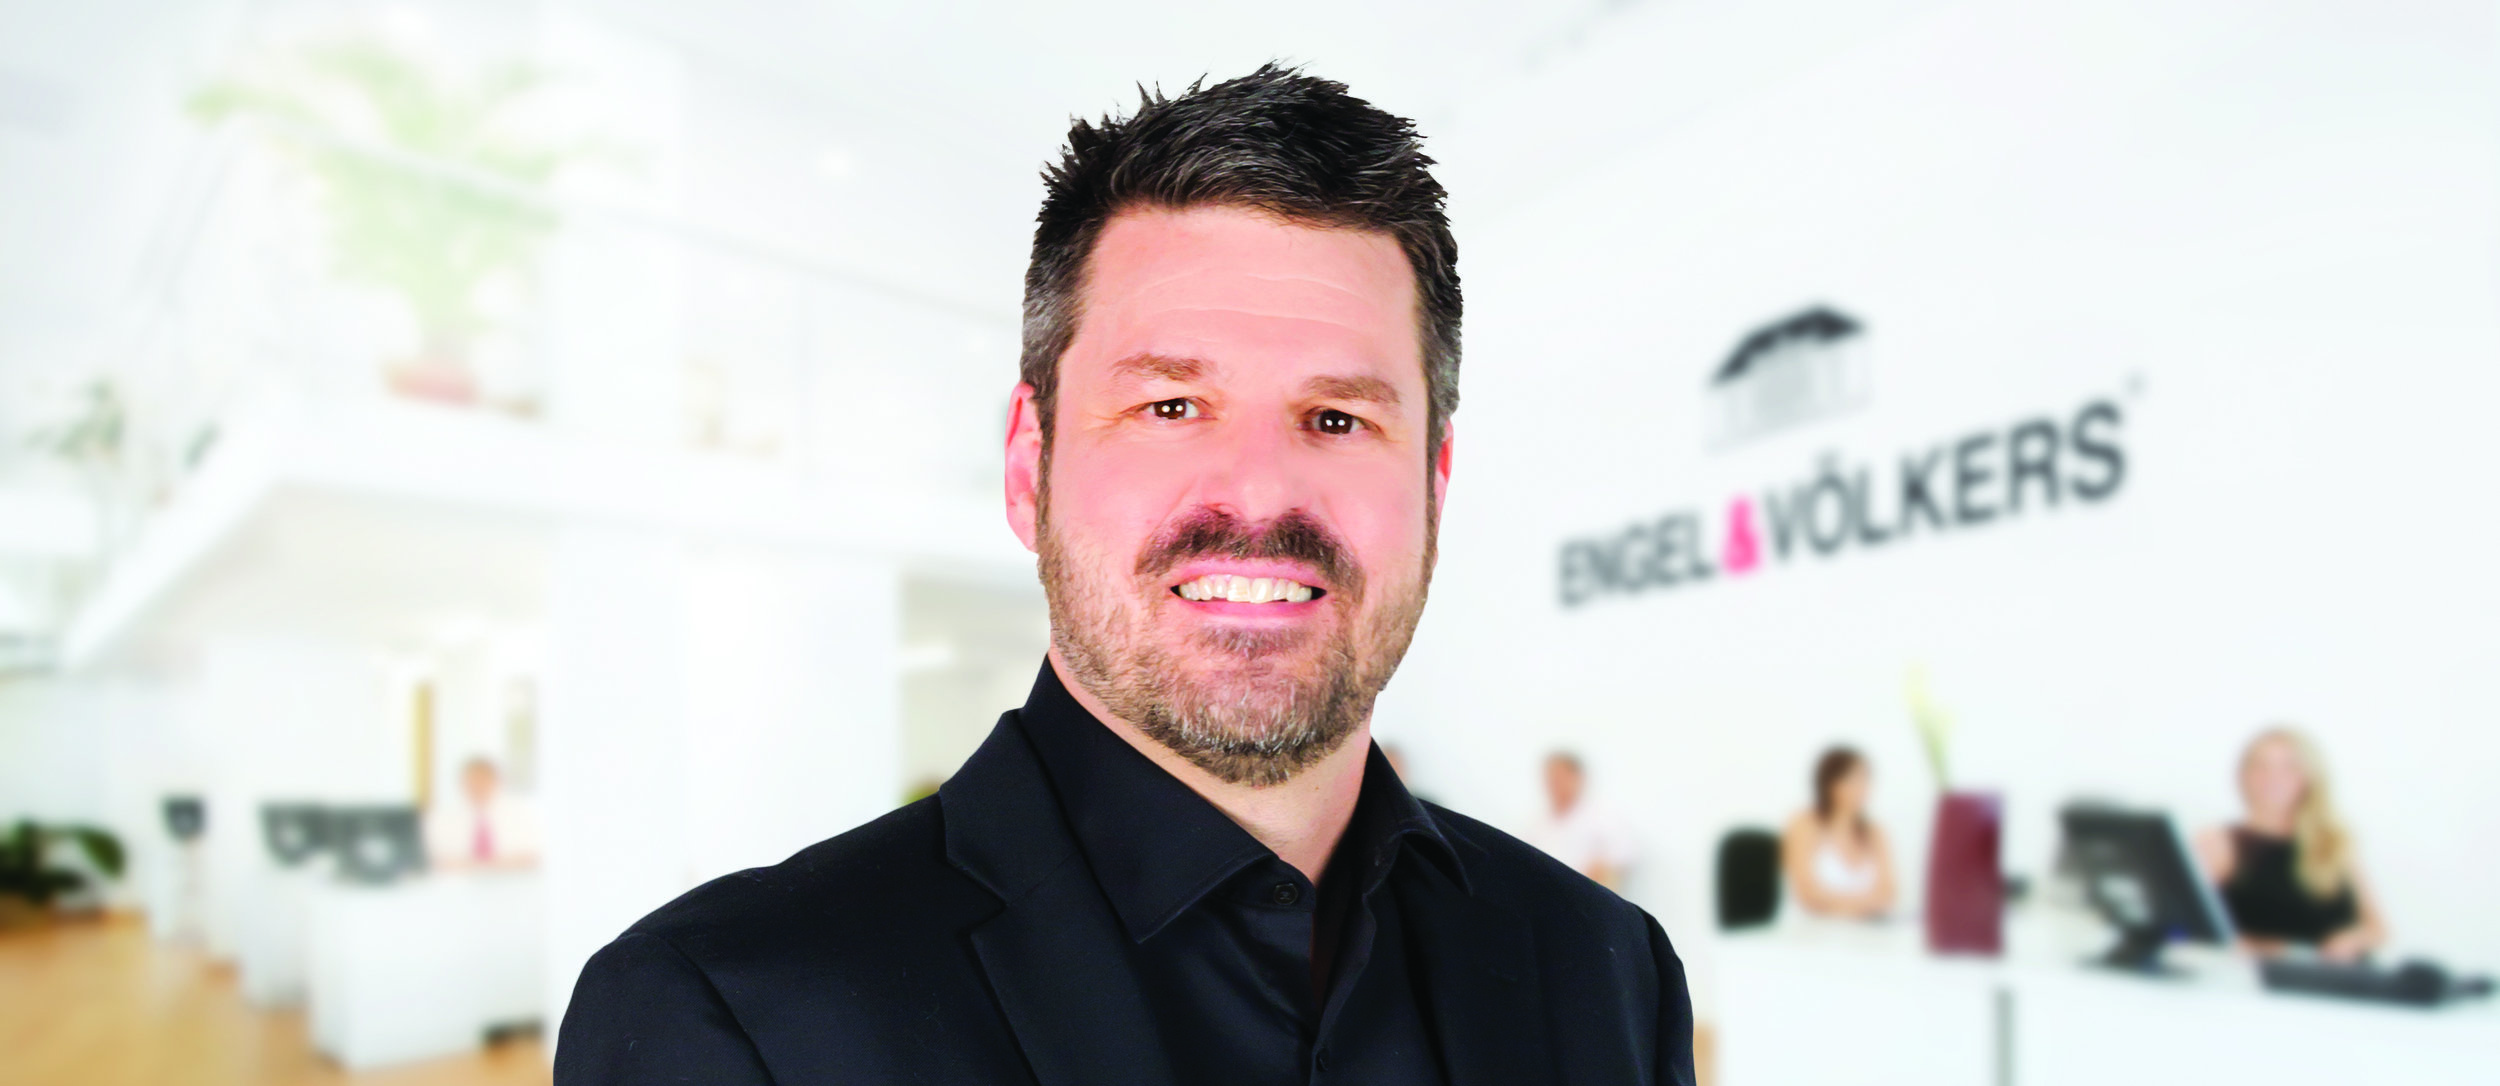 Rick Rybarczyk, Director of Marketing